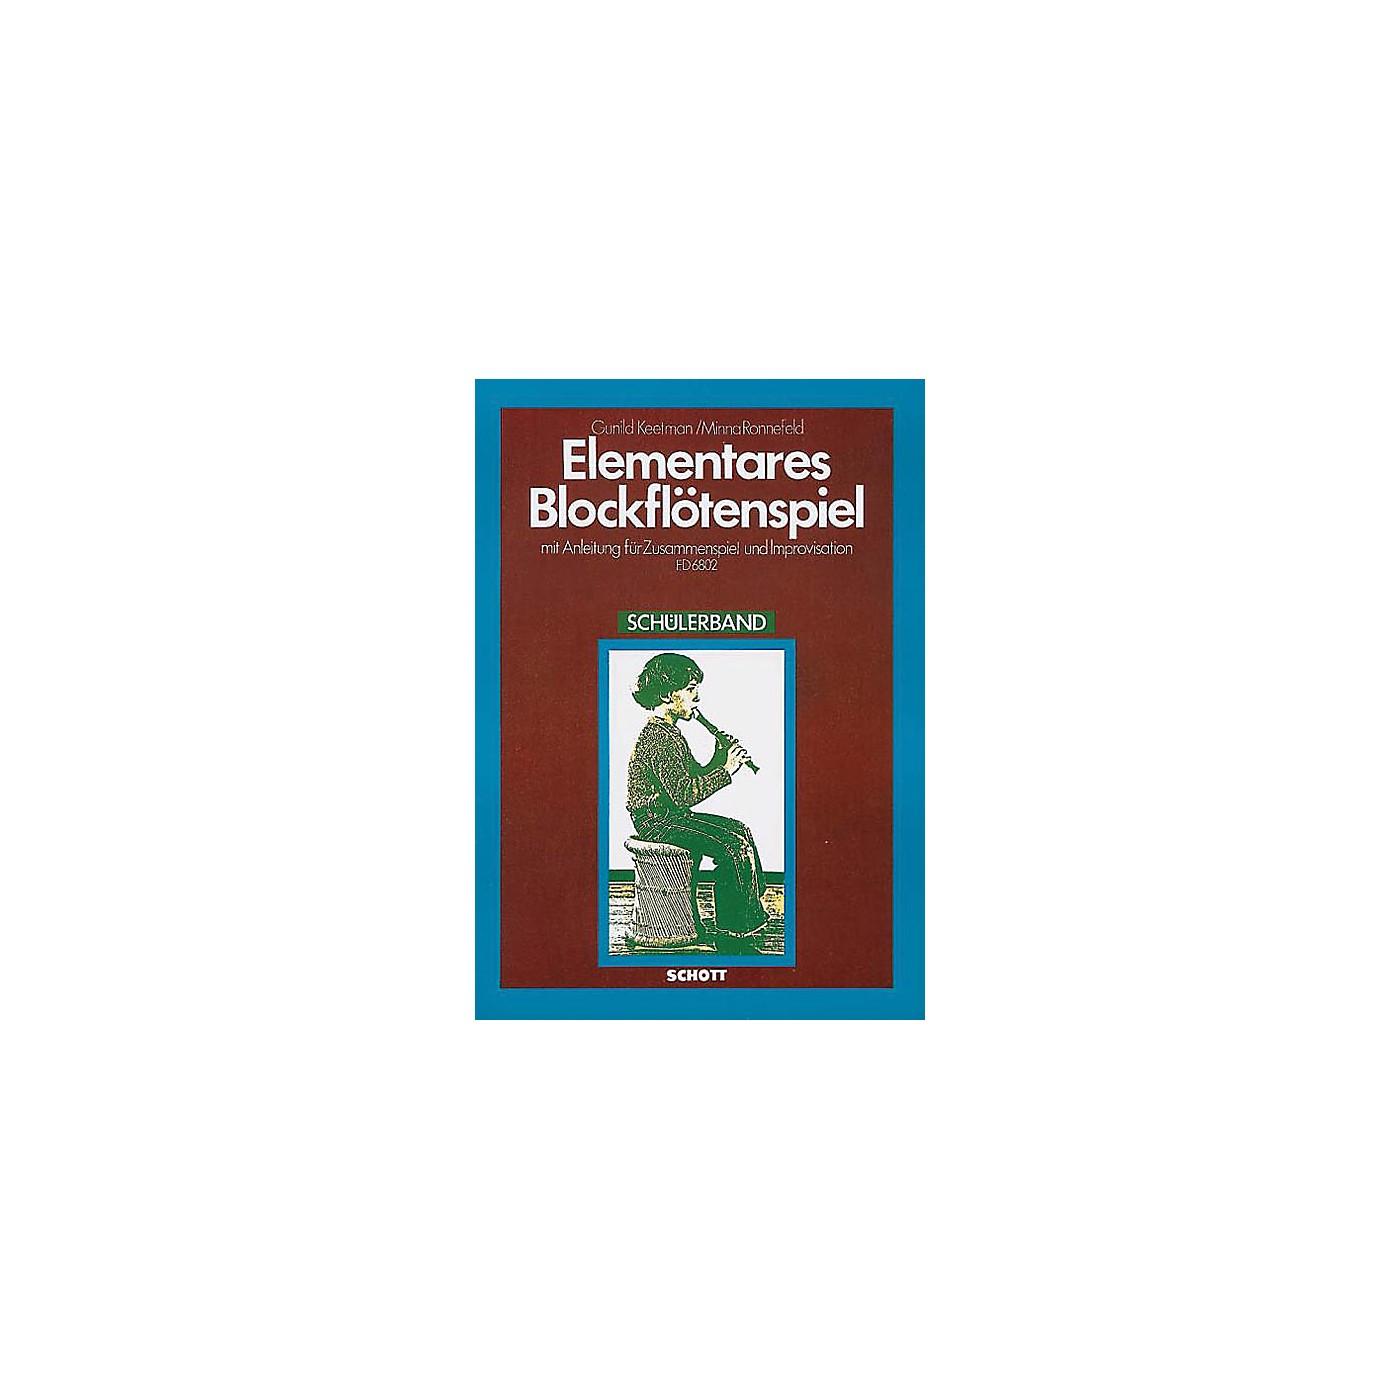 Schott Elementary Blockflotenspielstudent Schott Series thumbnail